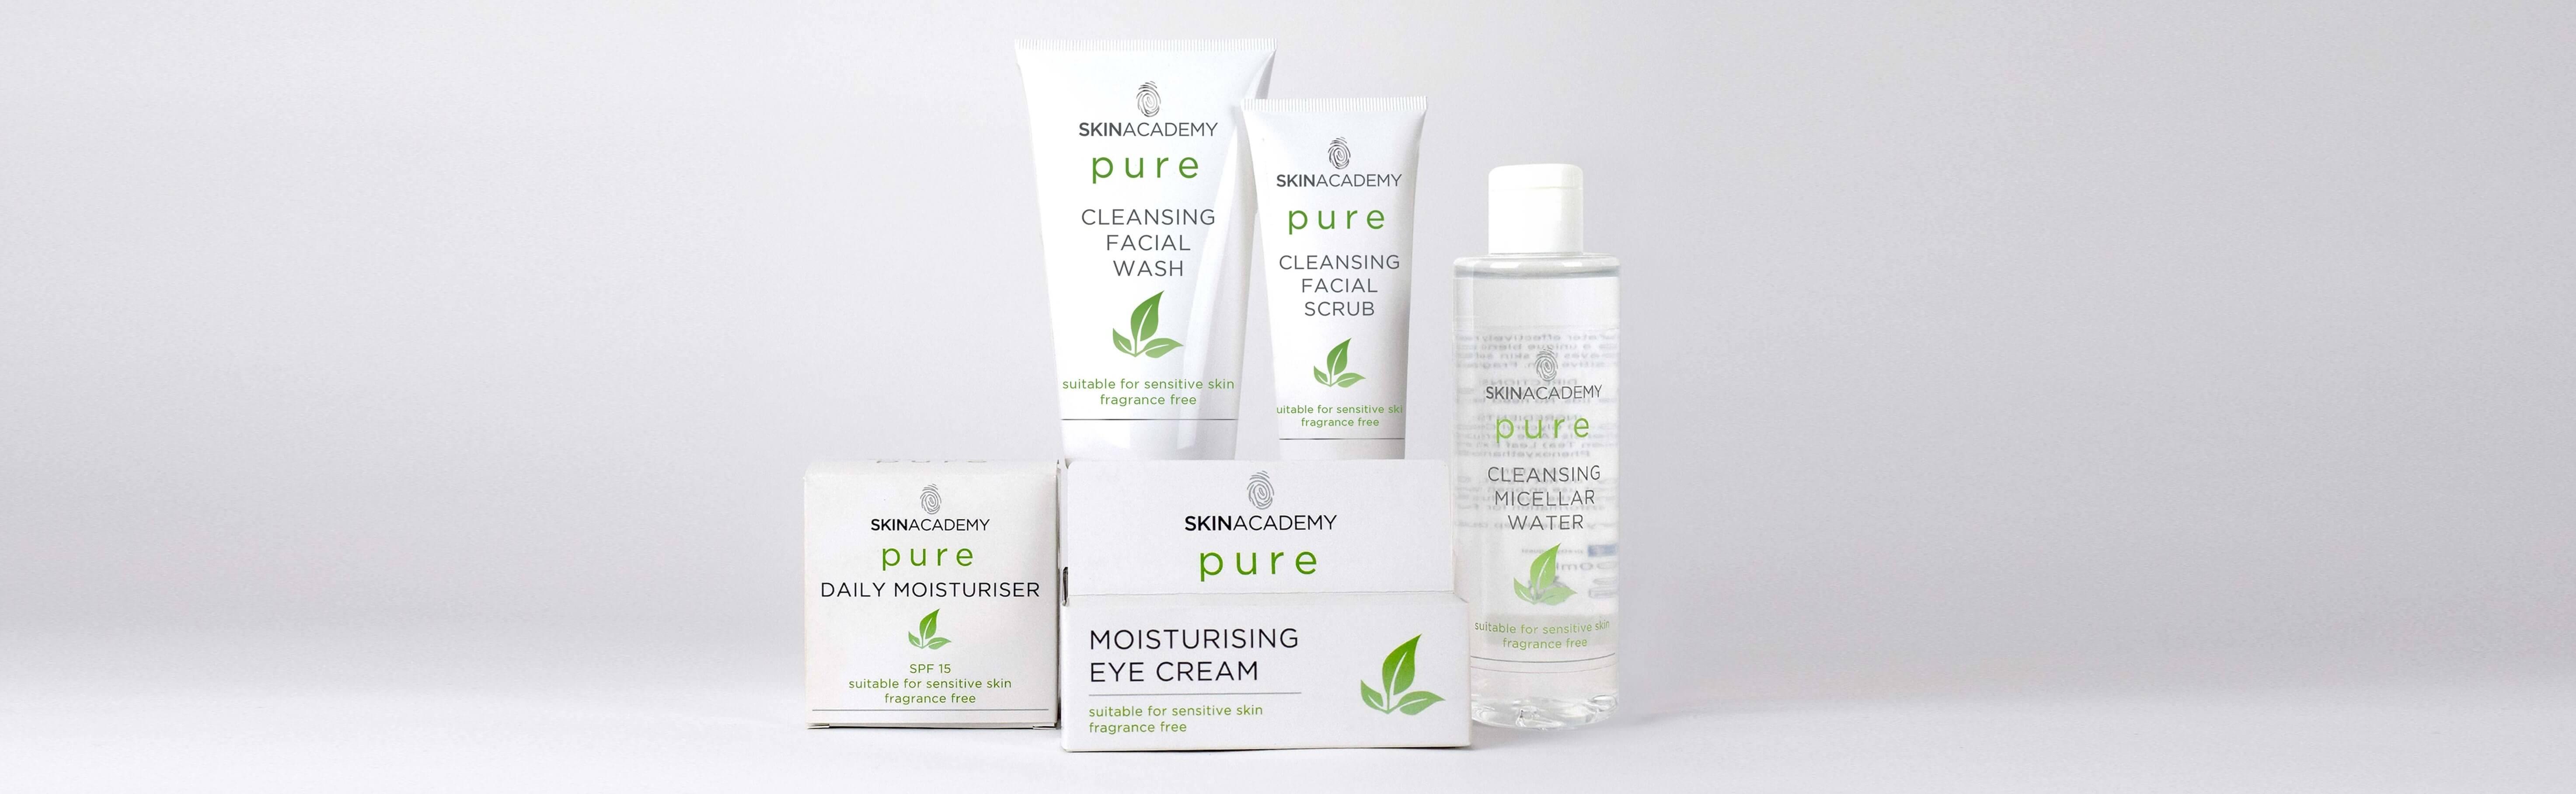 Skin Academy Pure Range Together